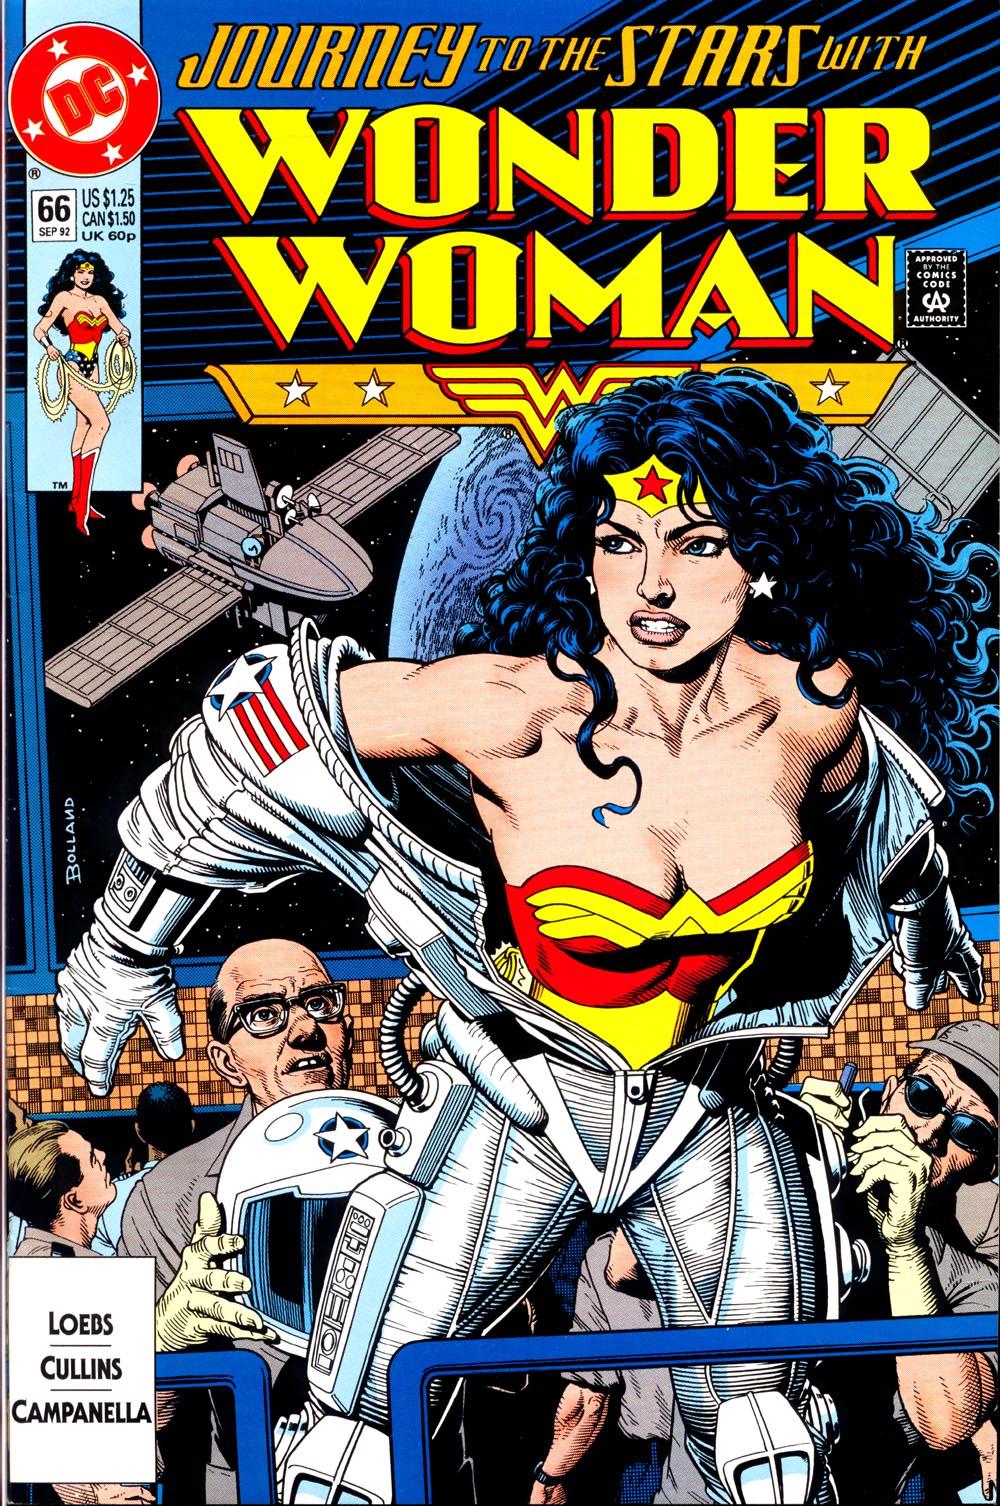 Read online Wonder Woman (1987) comic -  Issue #66 - 1